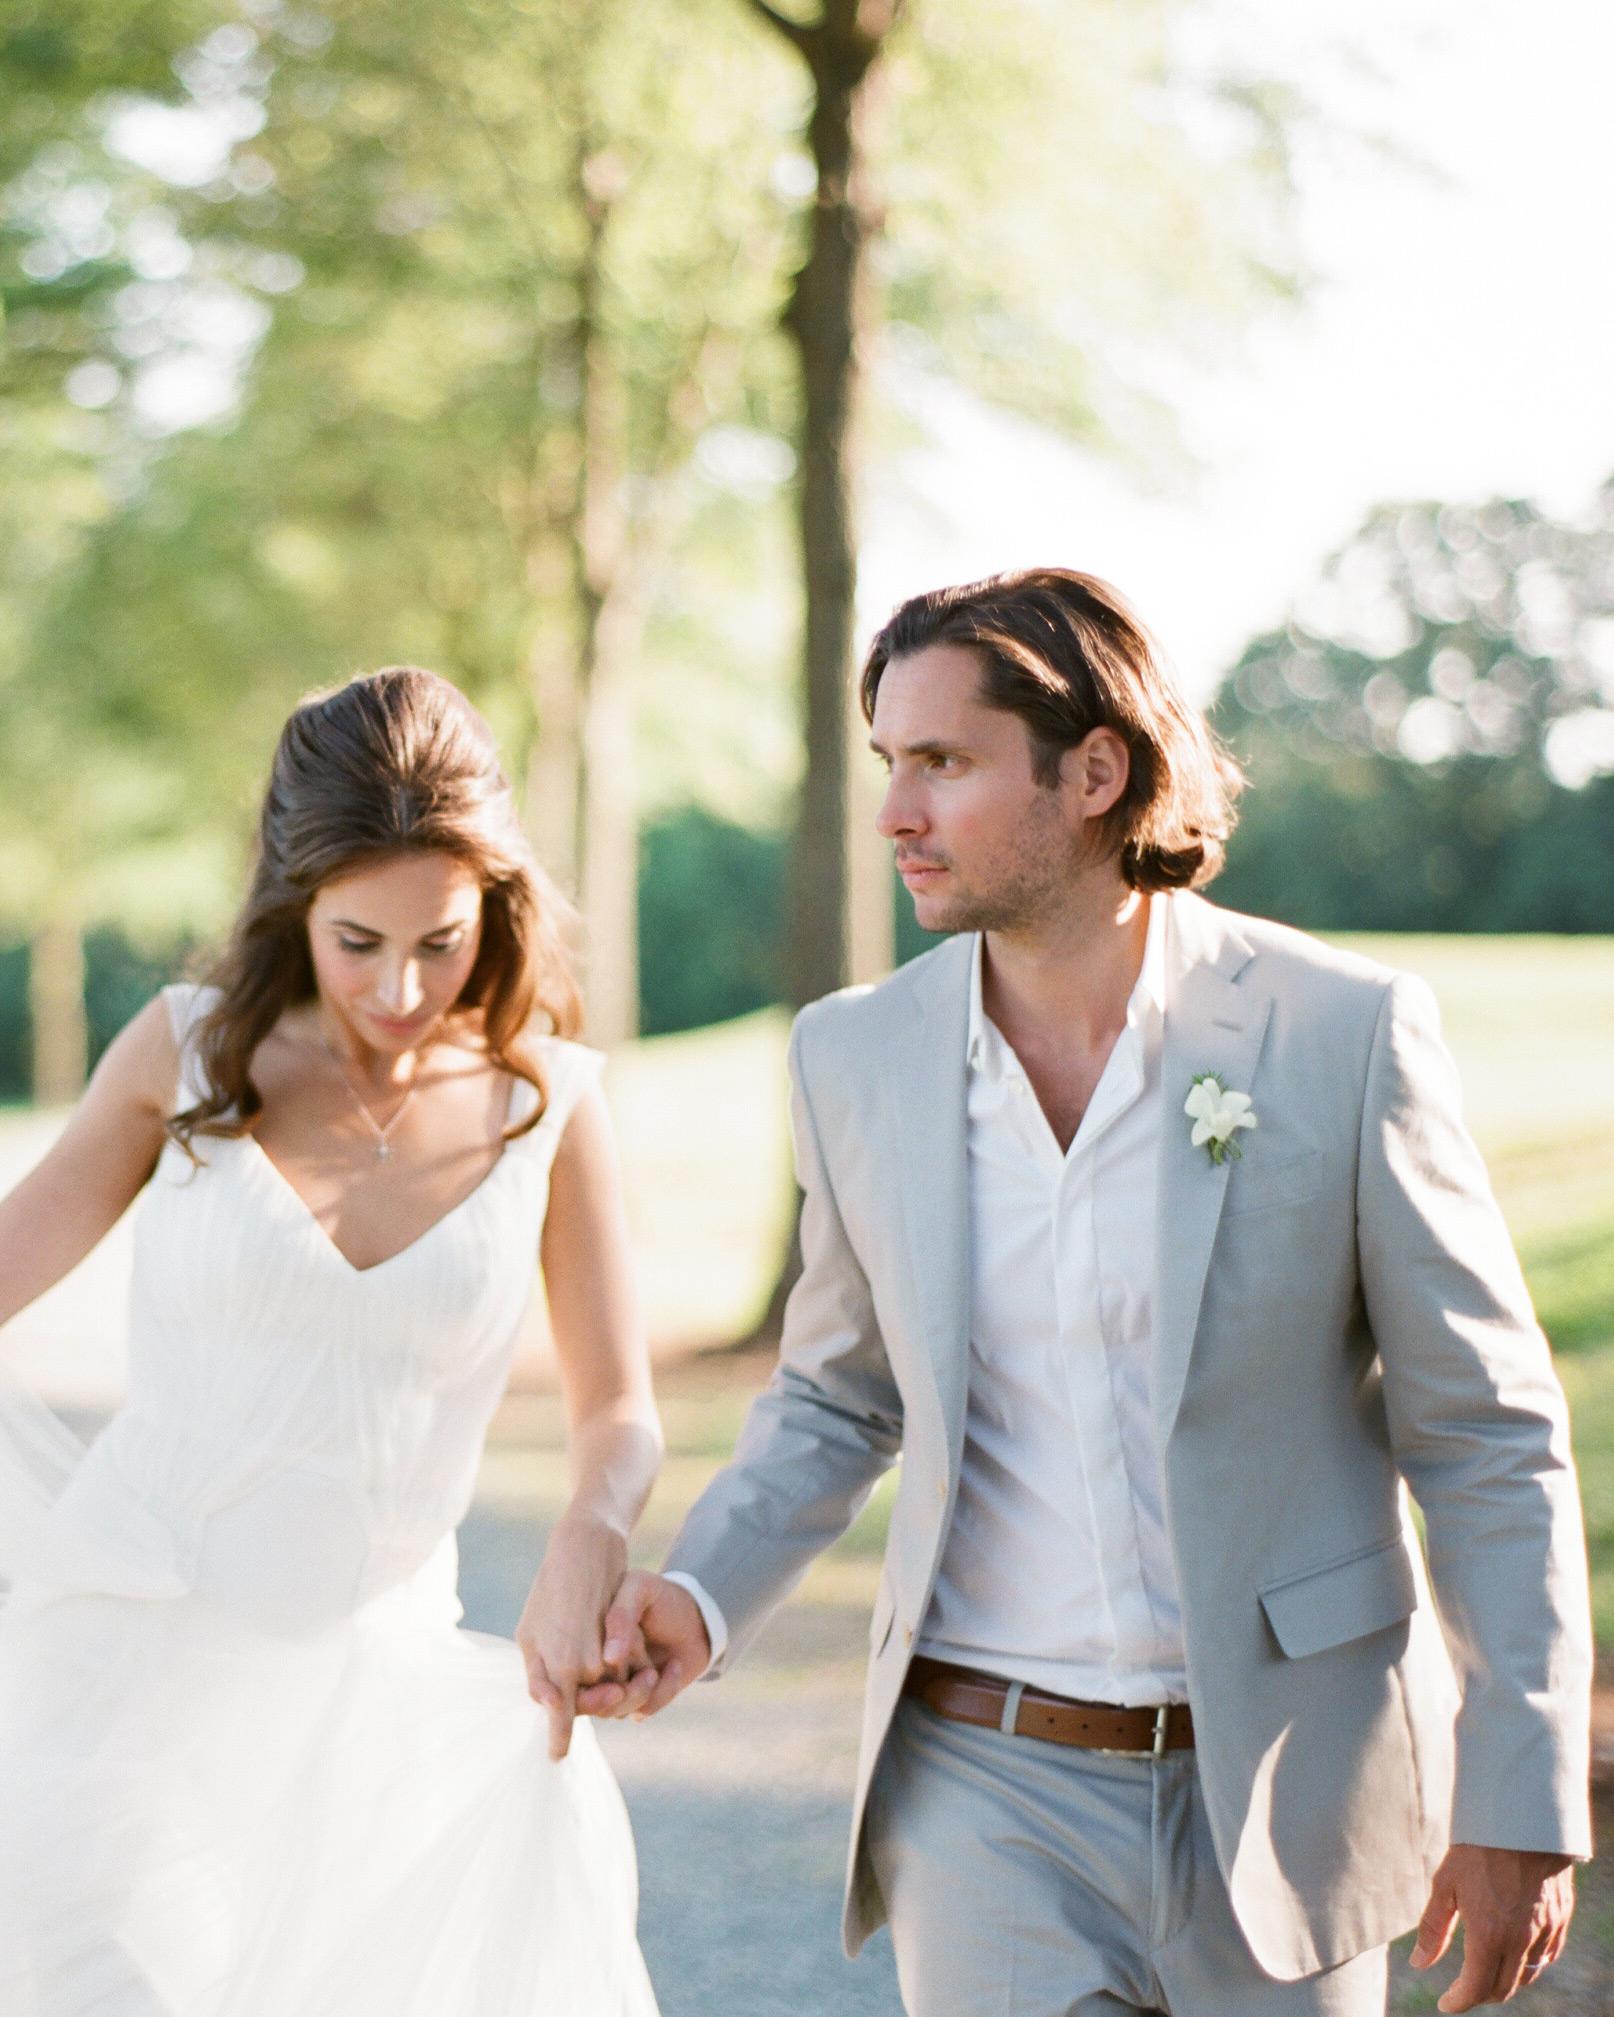 candid-bride-groom-wedding-photo-elisa-bricker-0716.jpg